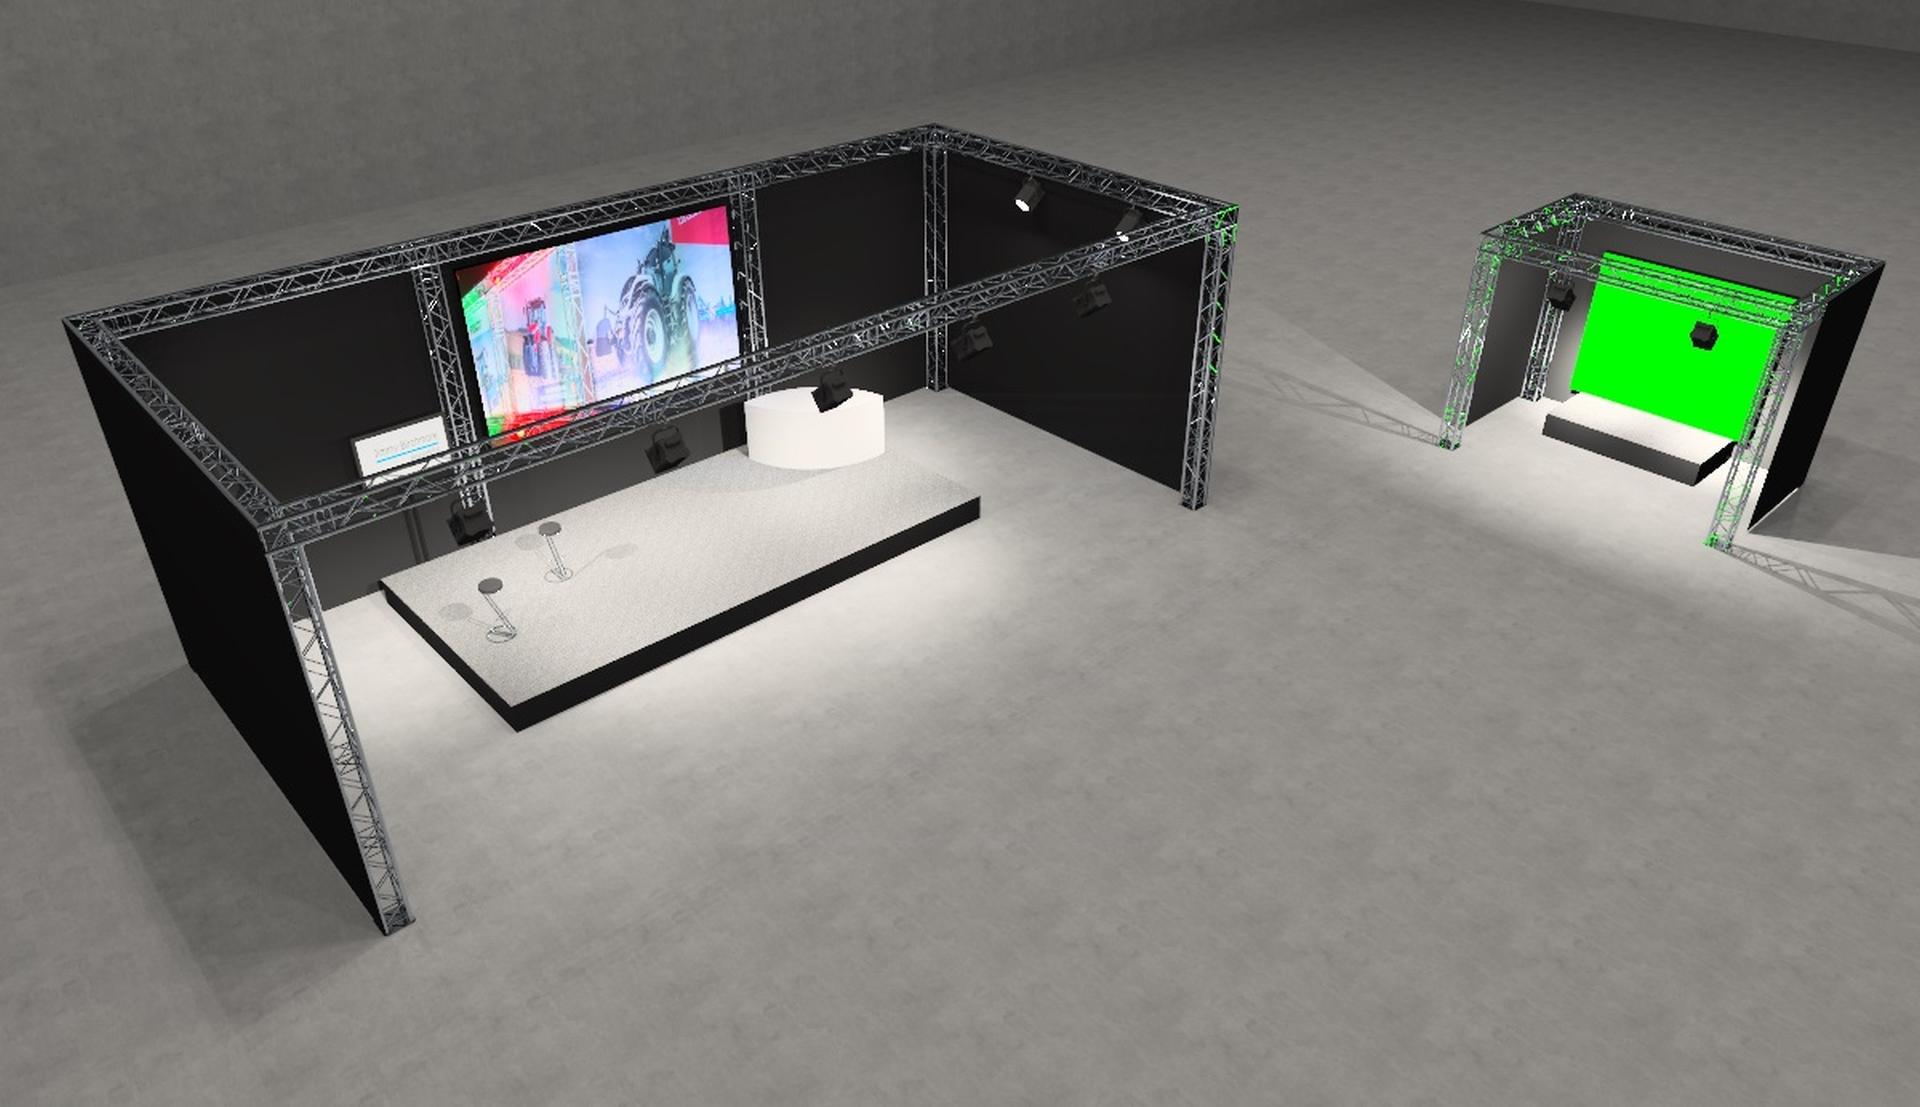 OneBigStar Virtual Studio Render